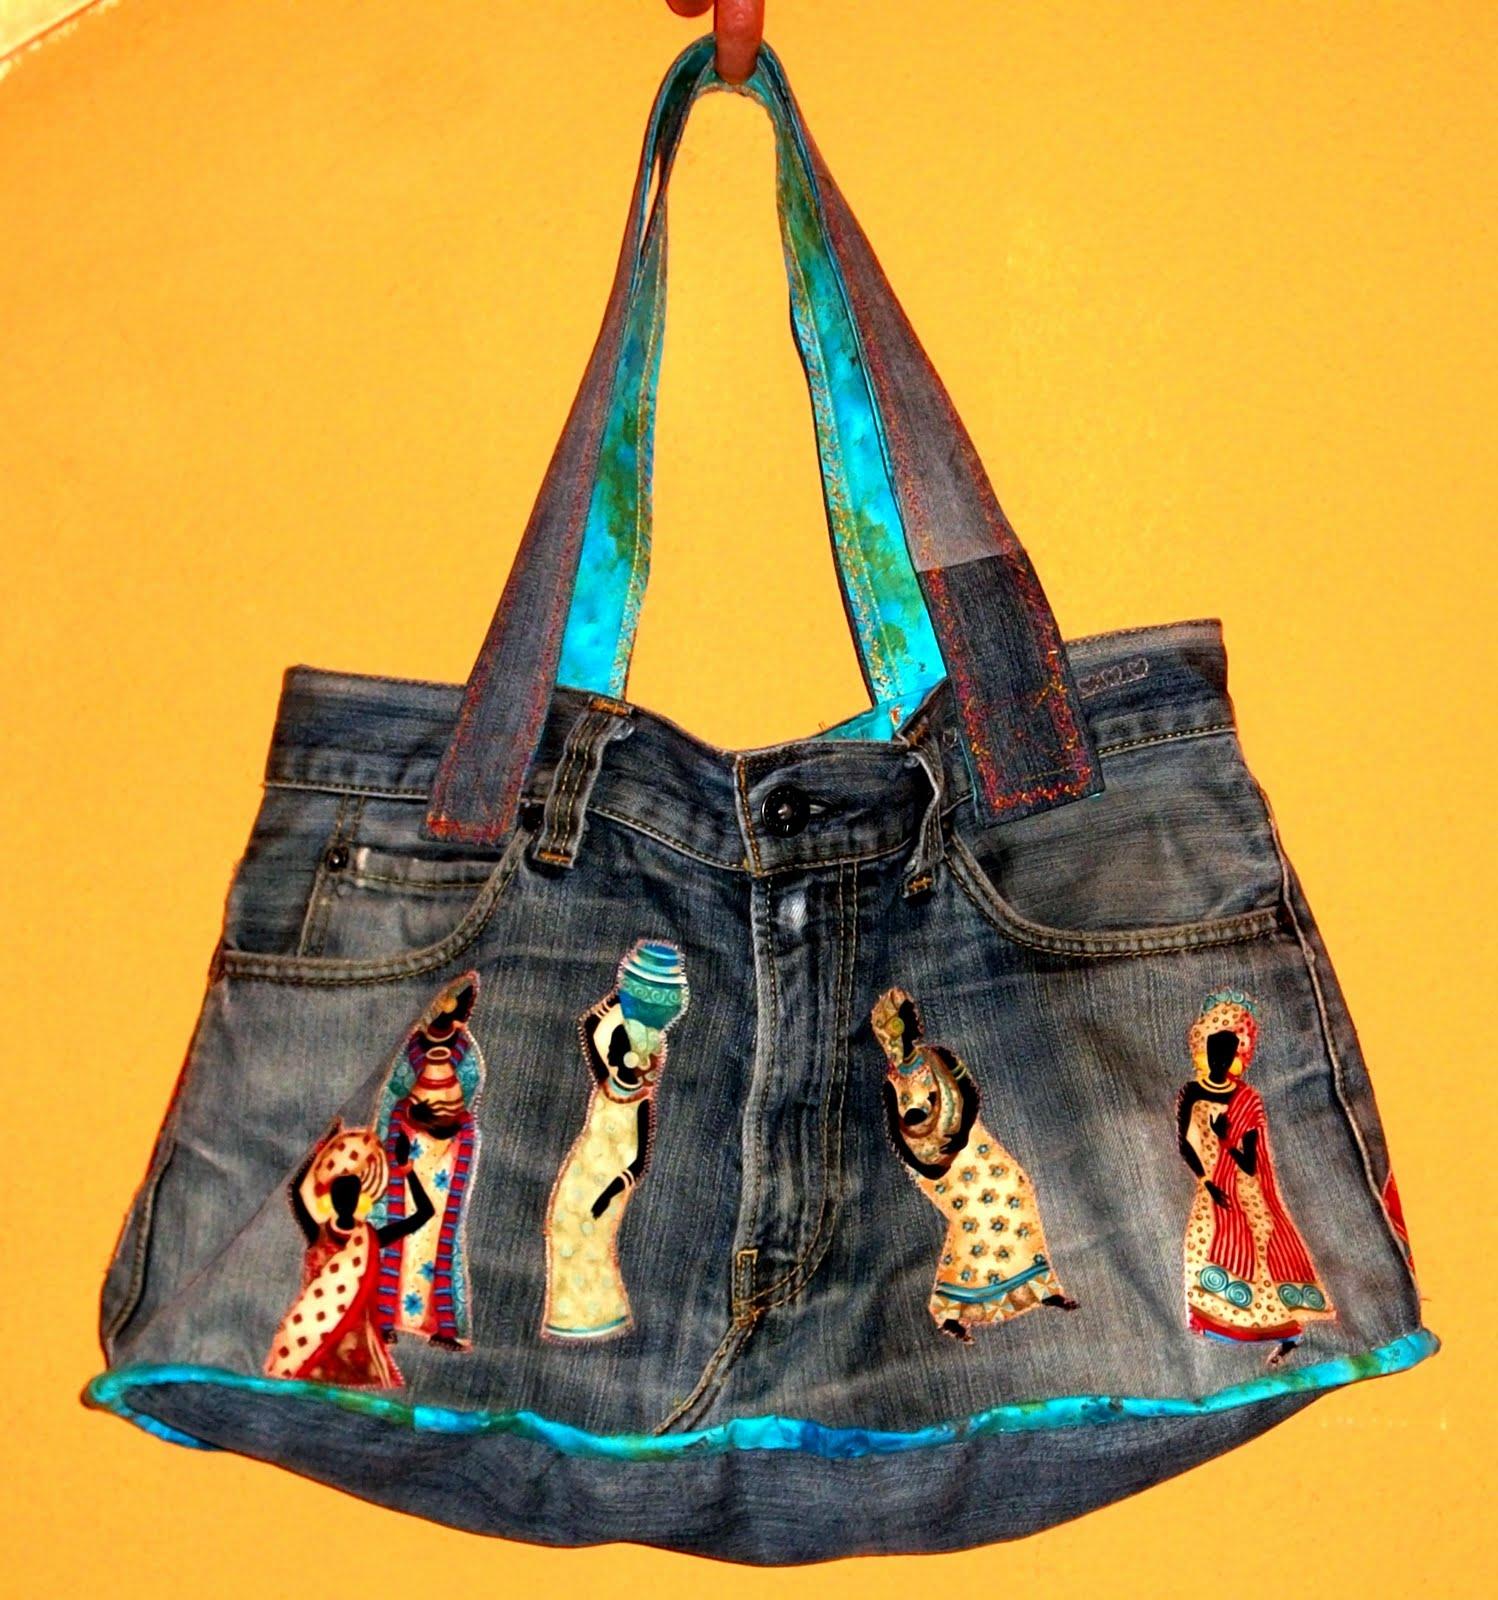 Bolso patchwork vaquero jeans patchwork isabel gonz lez - Manualidades patchwork bolsos ...